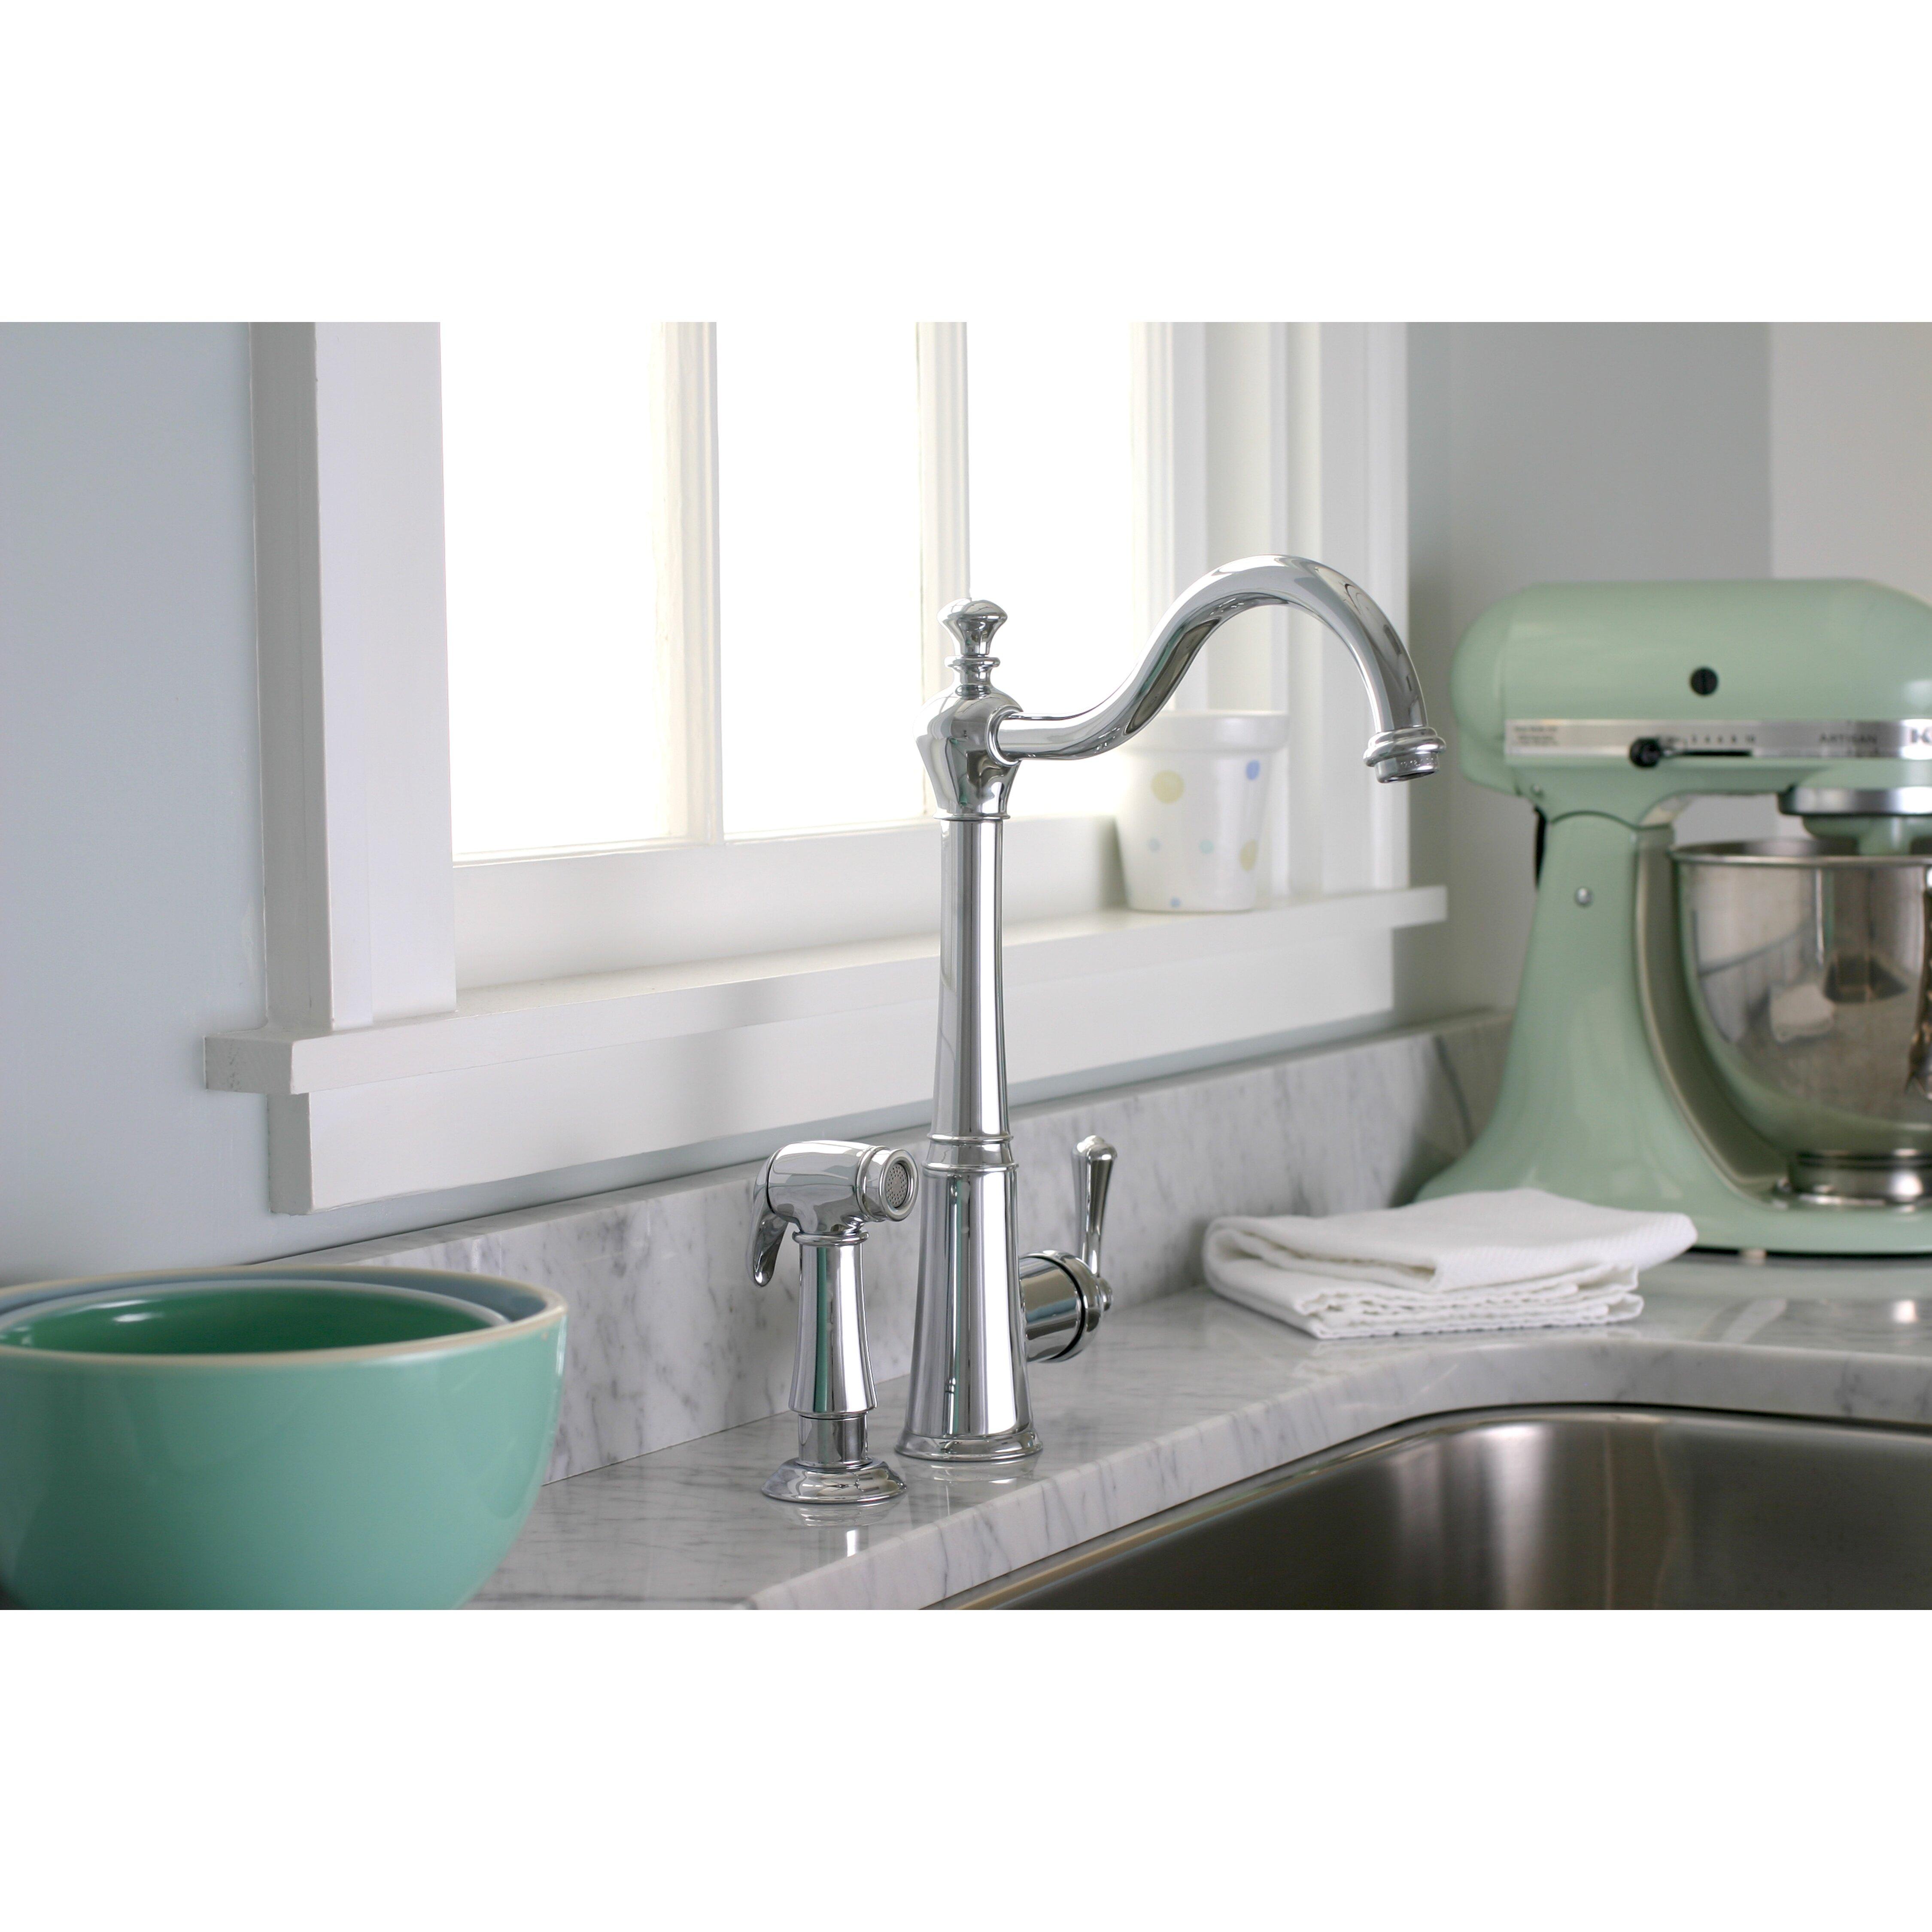 Premier Faucet Sonoma One Handle Single Hole Kitchen Faucet With. Single Handle Kitchen Faucet With Side Spray   emmolo com